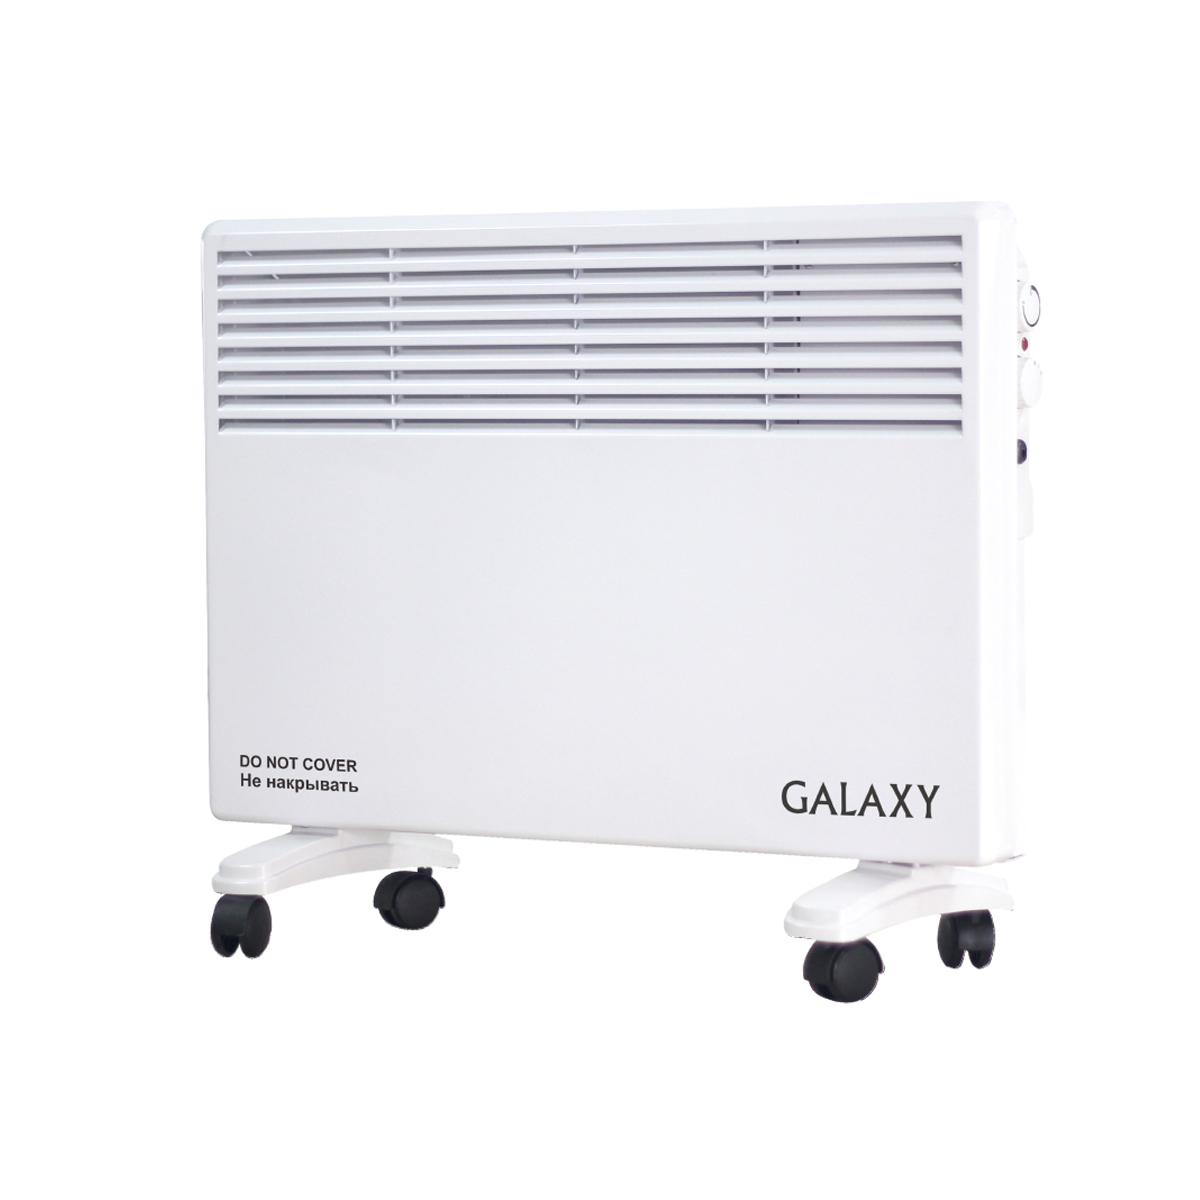 Galaxy GL 8227 обогреватель galaxy gl 4922 blue pink насадки к наборам для педикюра